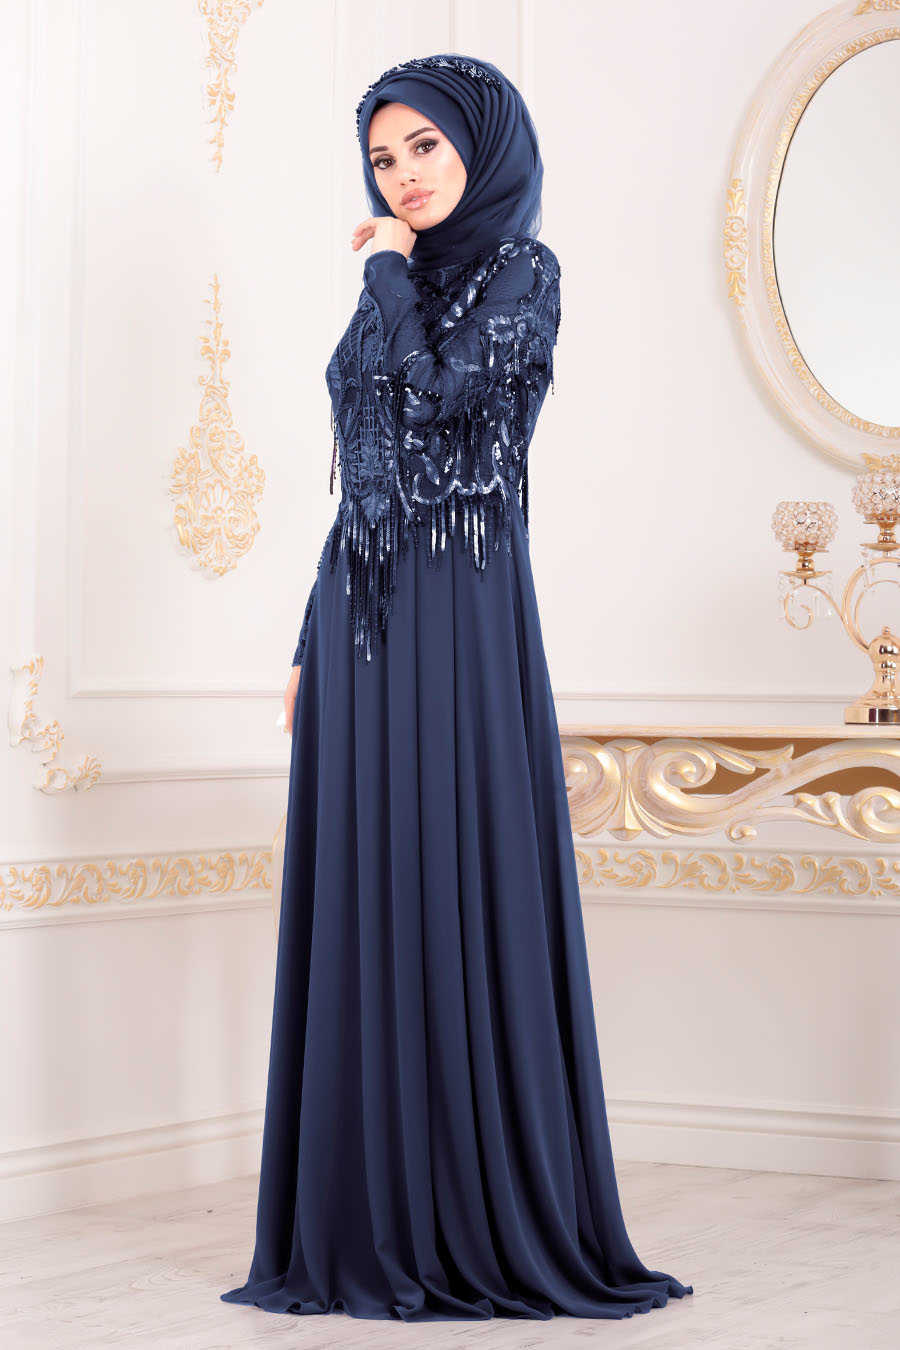 Neva Style - Navy Blue Hijab Evening Dress 4591L